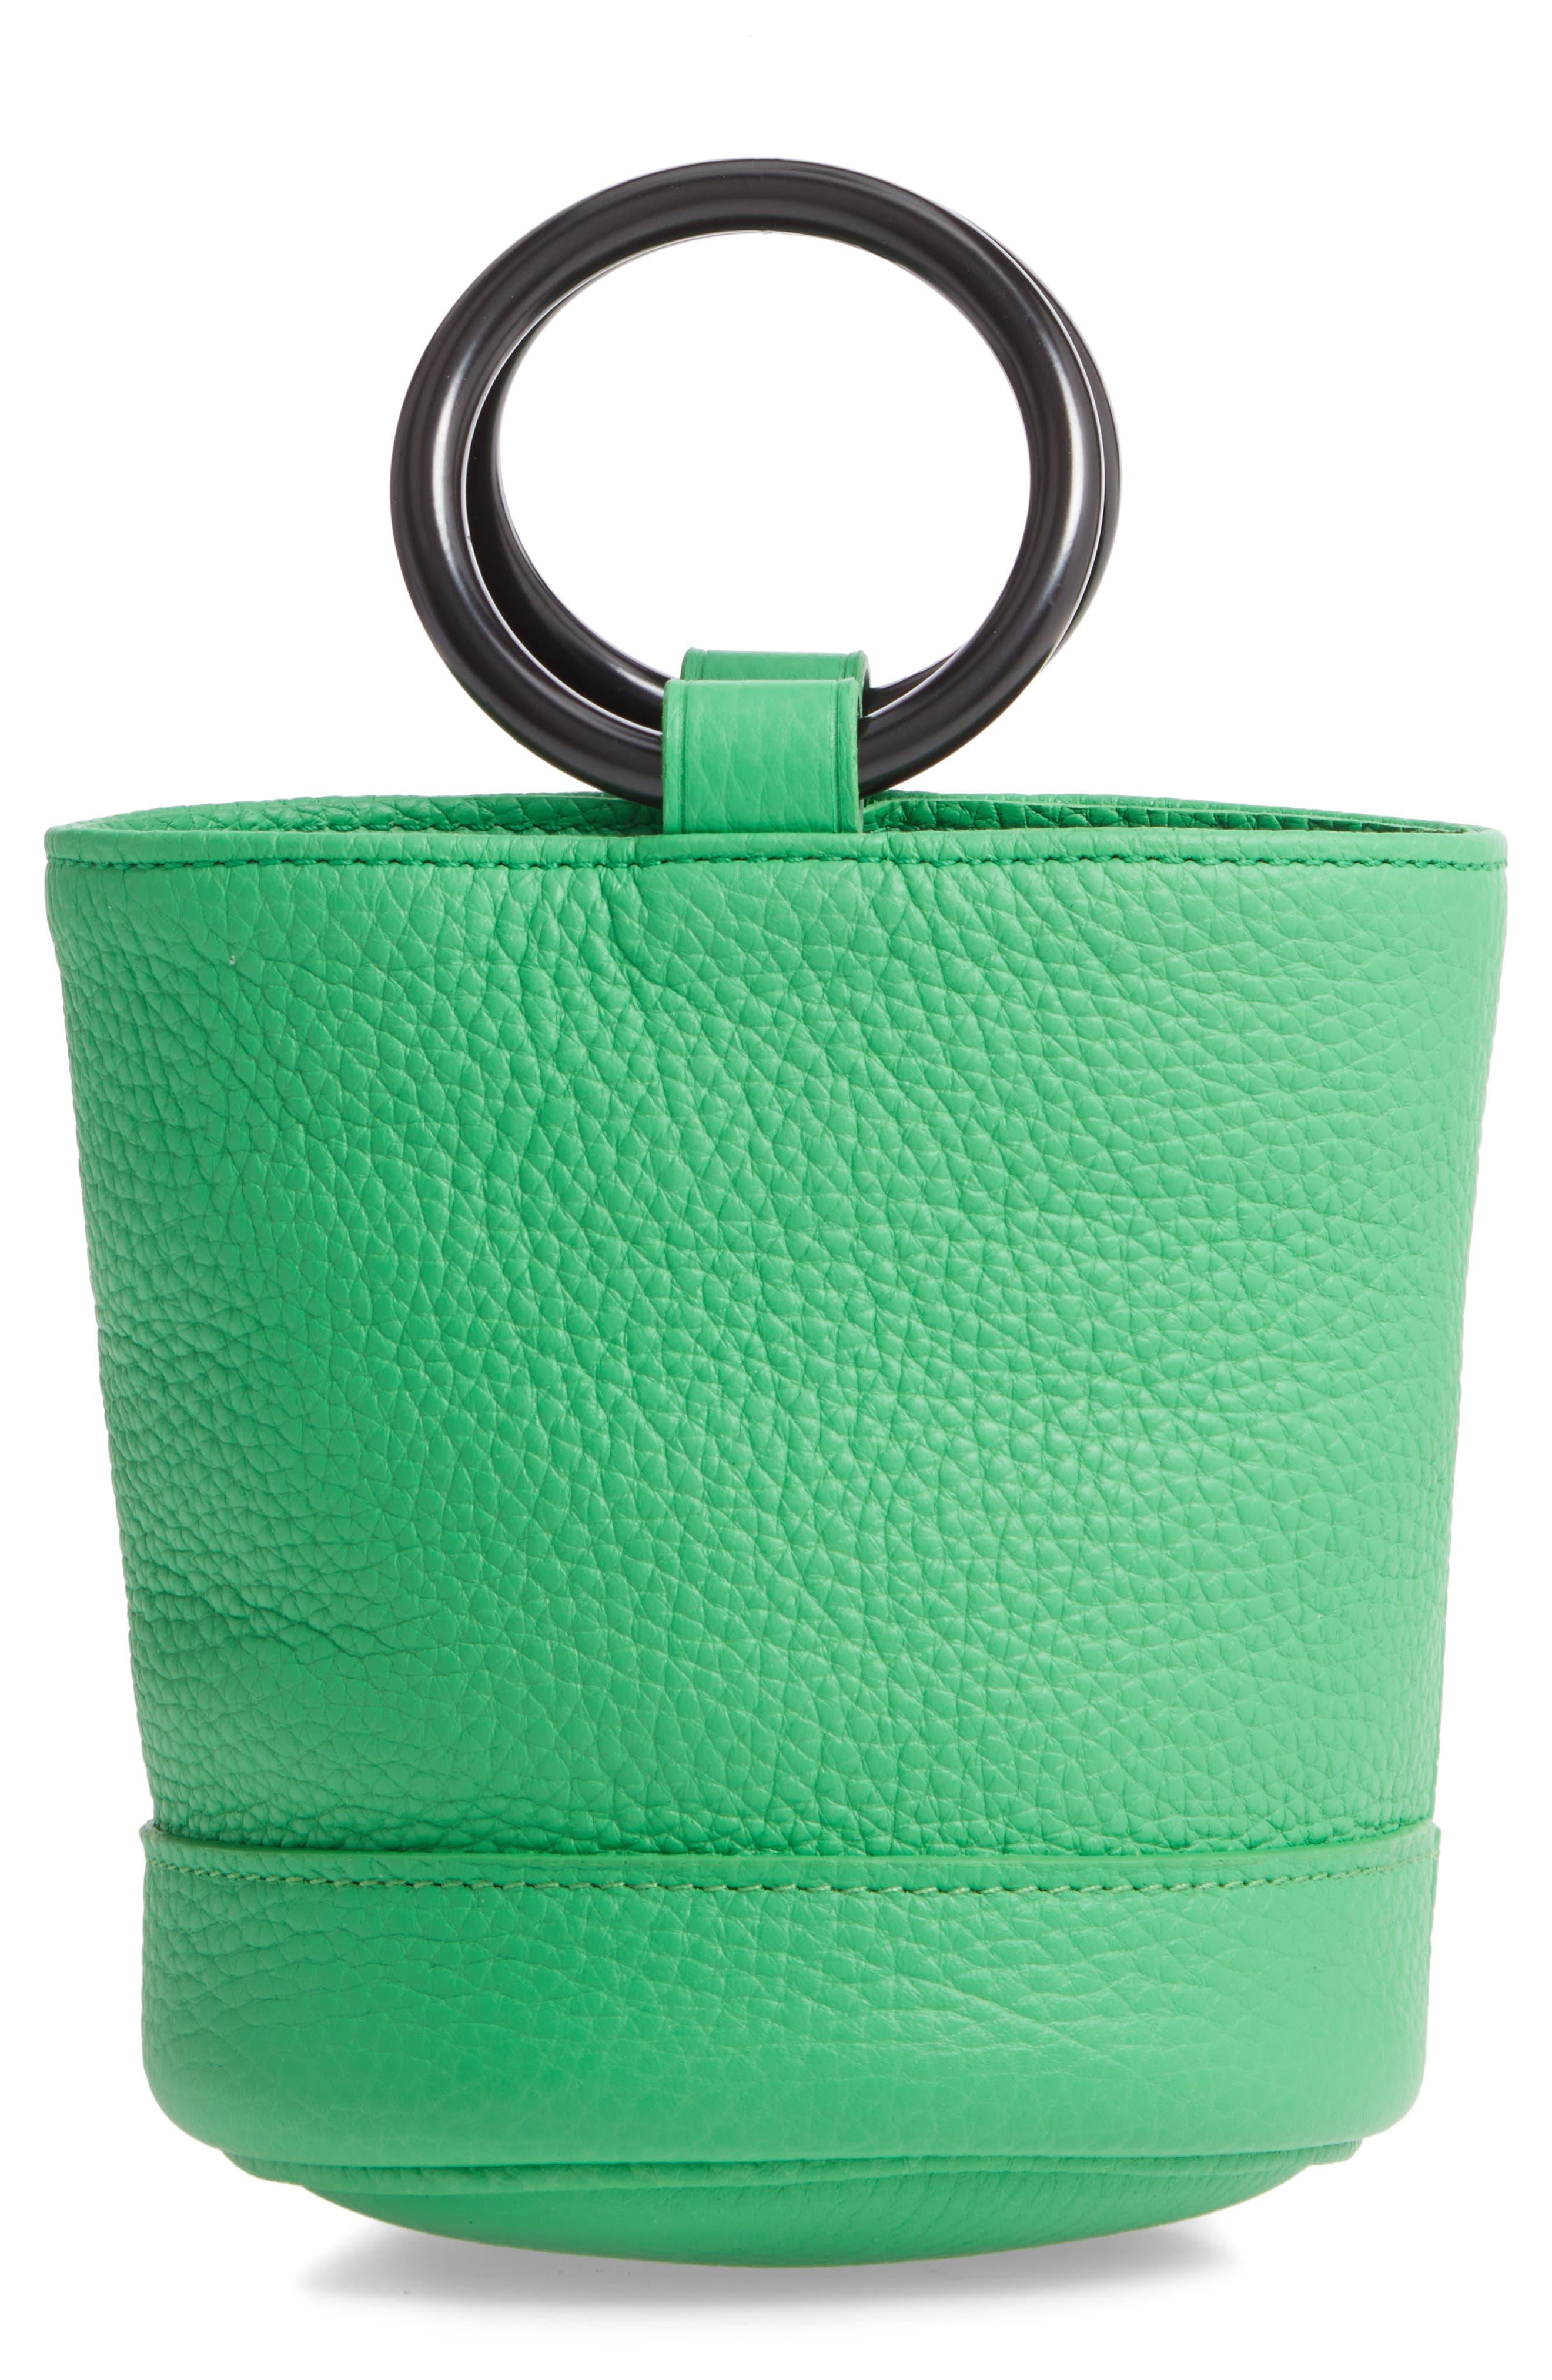 SIMON MILLER, Bonsai 15 Calfskin Leather Bucket Bag, Main thumbnail 1, color, NEON GREEN